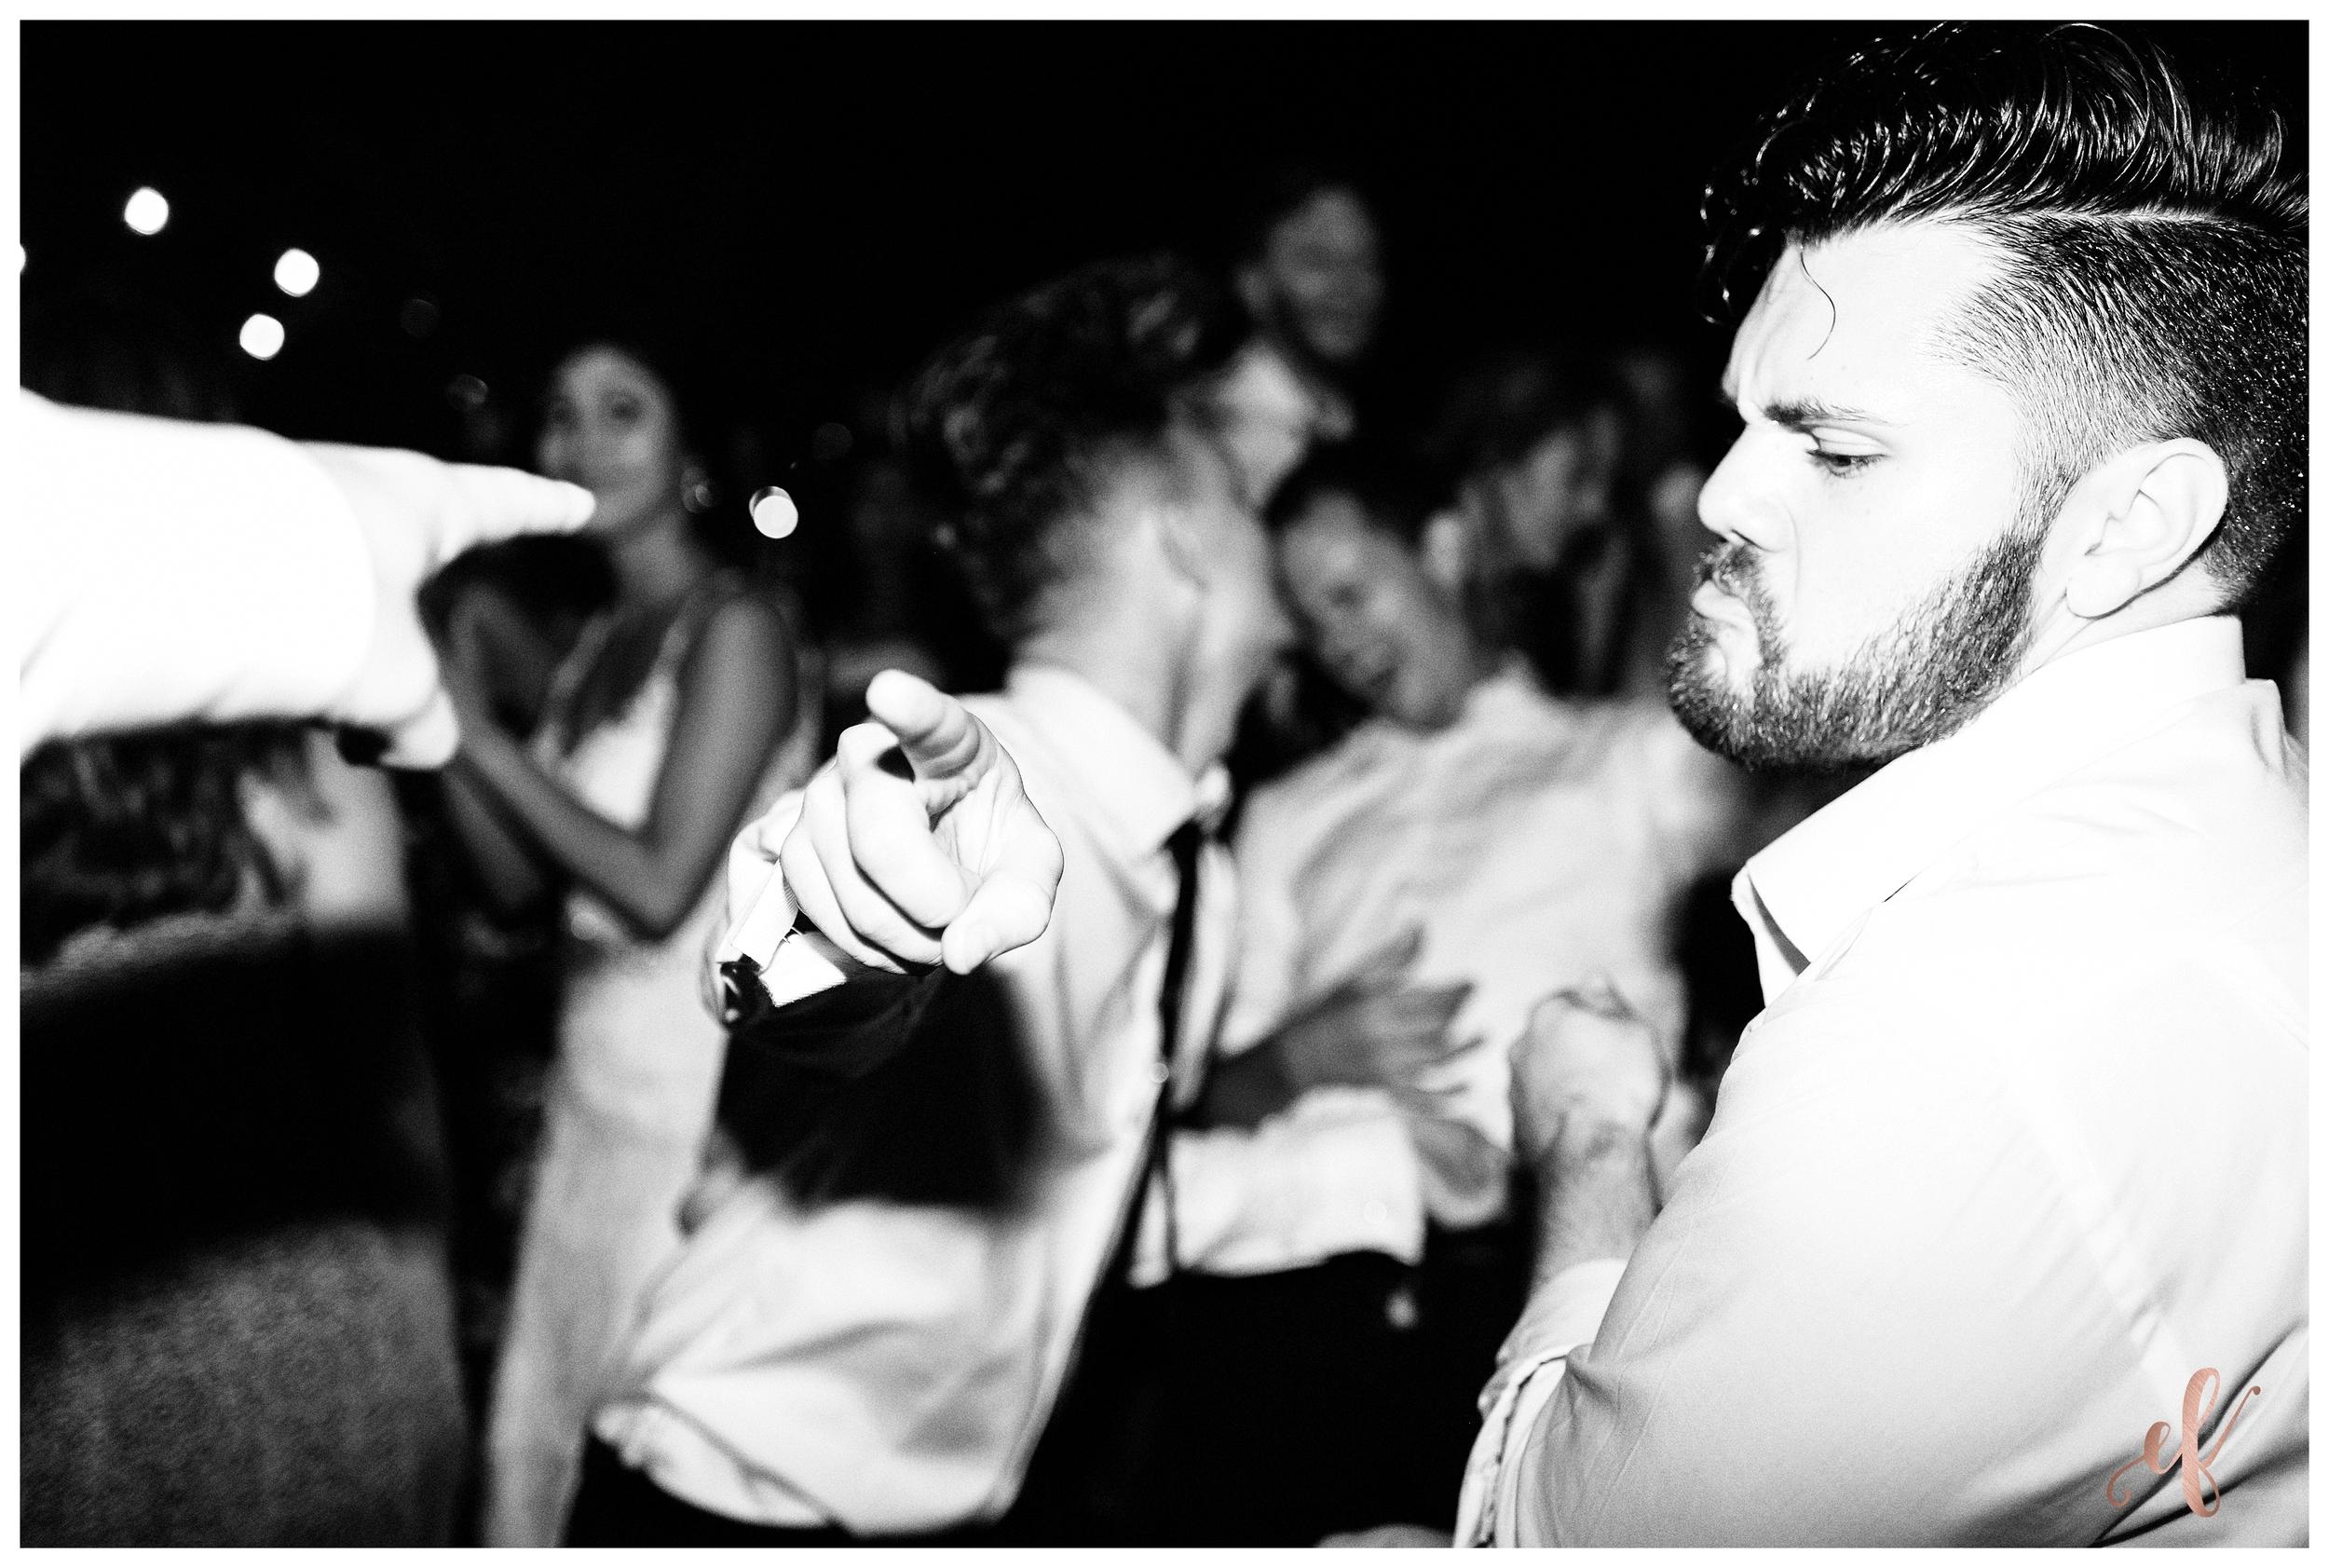 San Diego Wedding Photographer   Ernie & Fiona Photography San Diego Wedding Photographer   Ernie & Fiona Photography   Dancing   Reception   Party   Groom